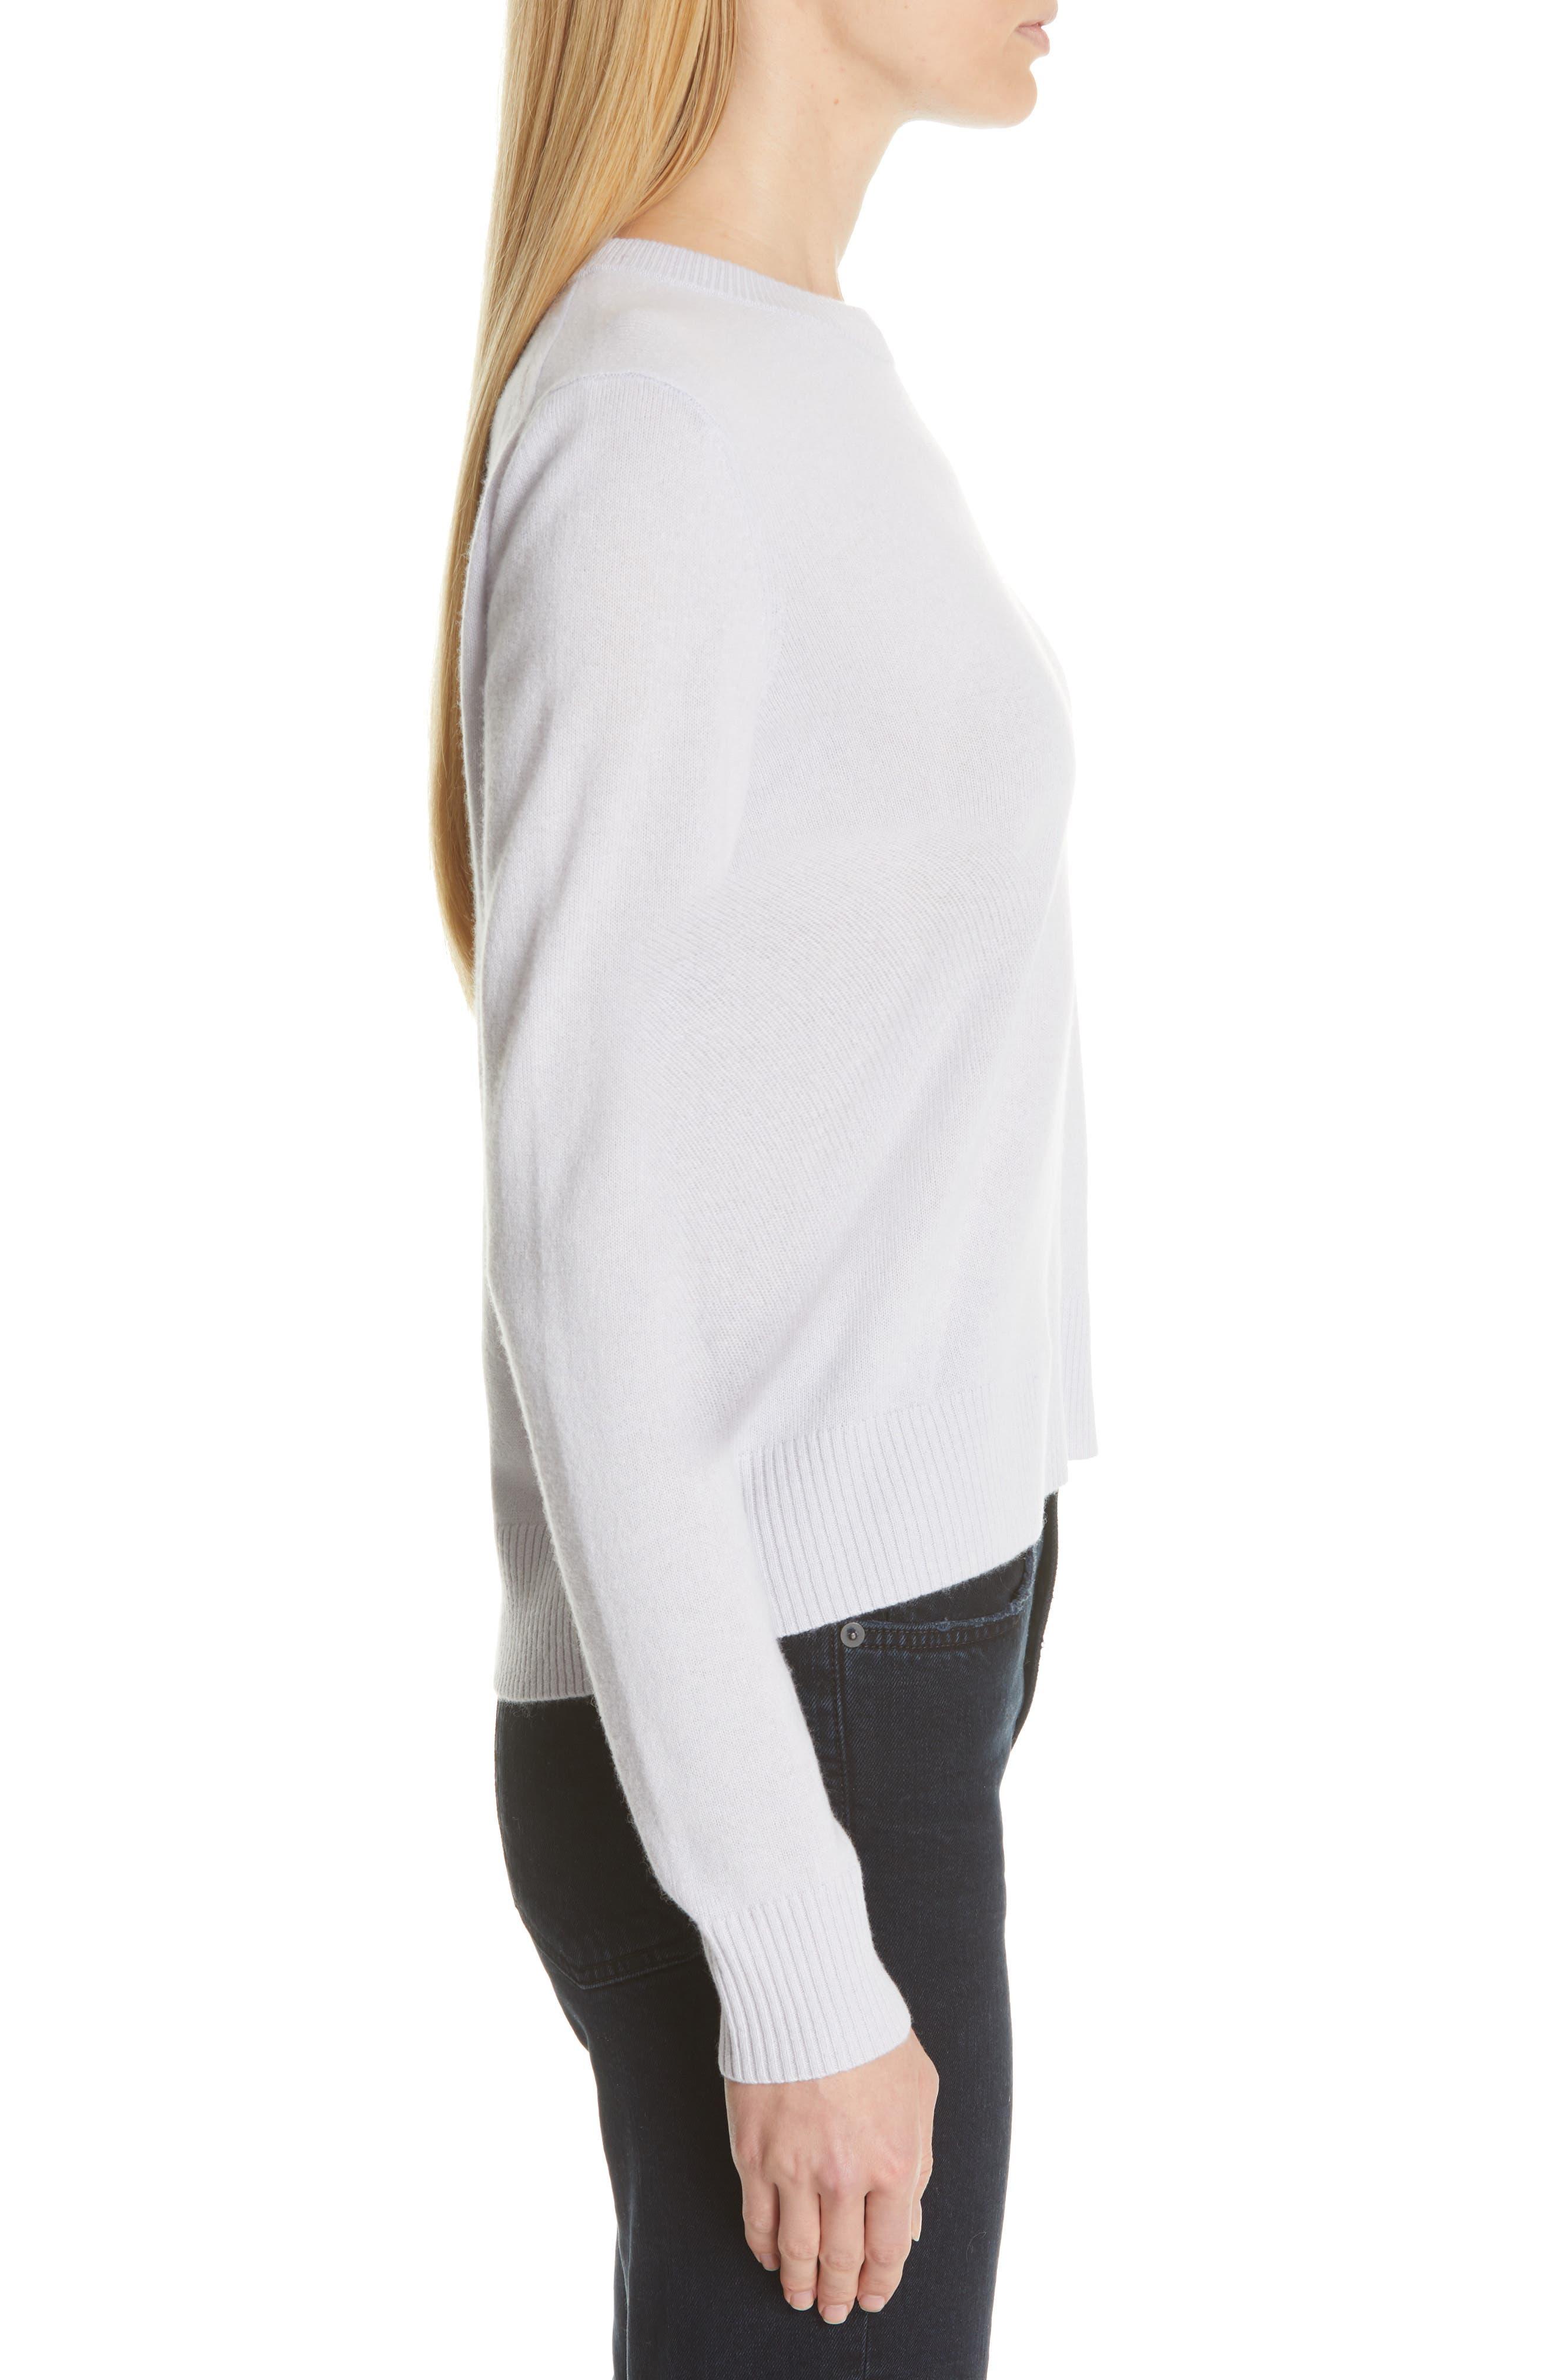 PROENZA SCHOULER, Cashmere Sweater, Alternate thumbnail 3, color, BLUE GREY